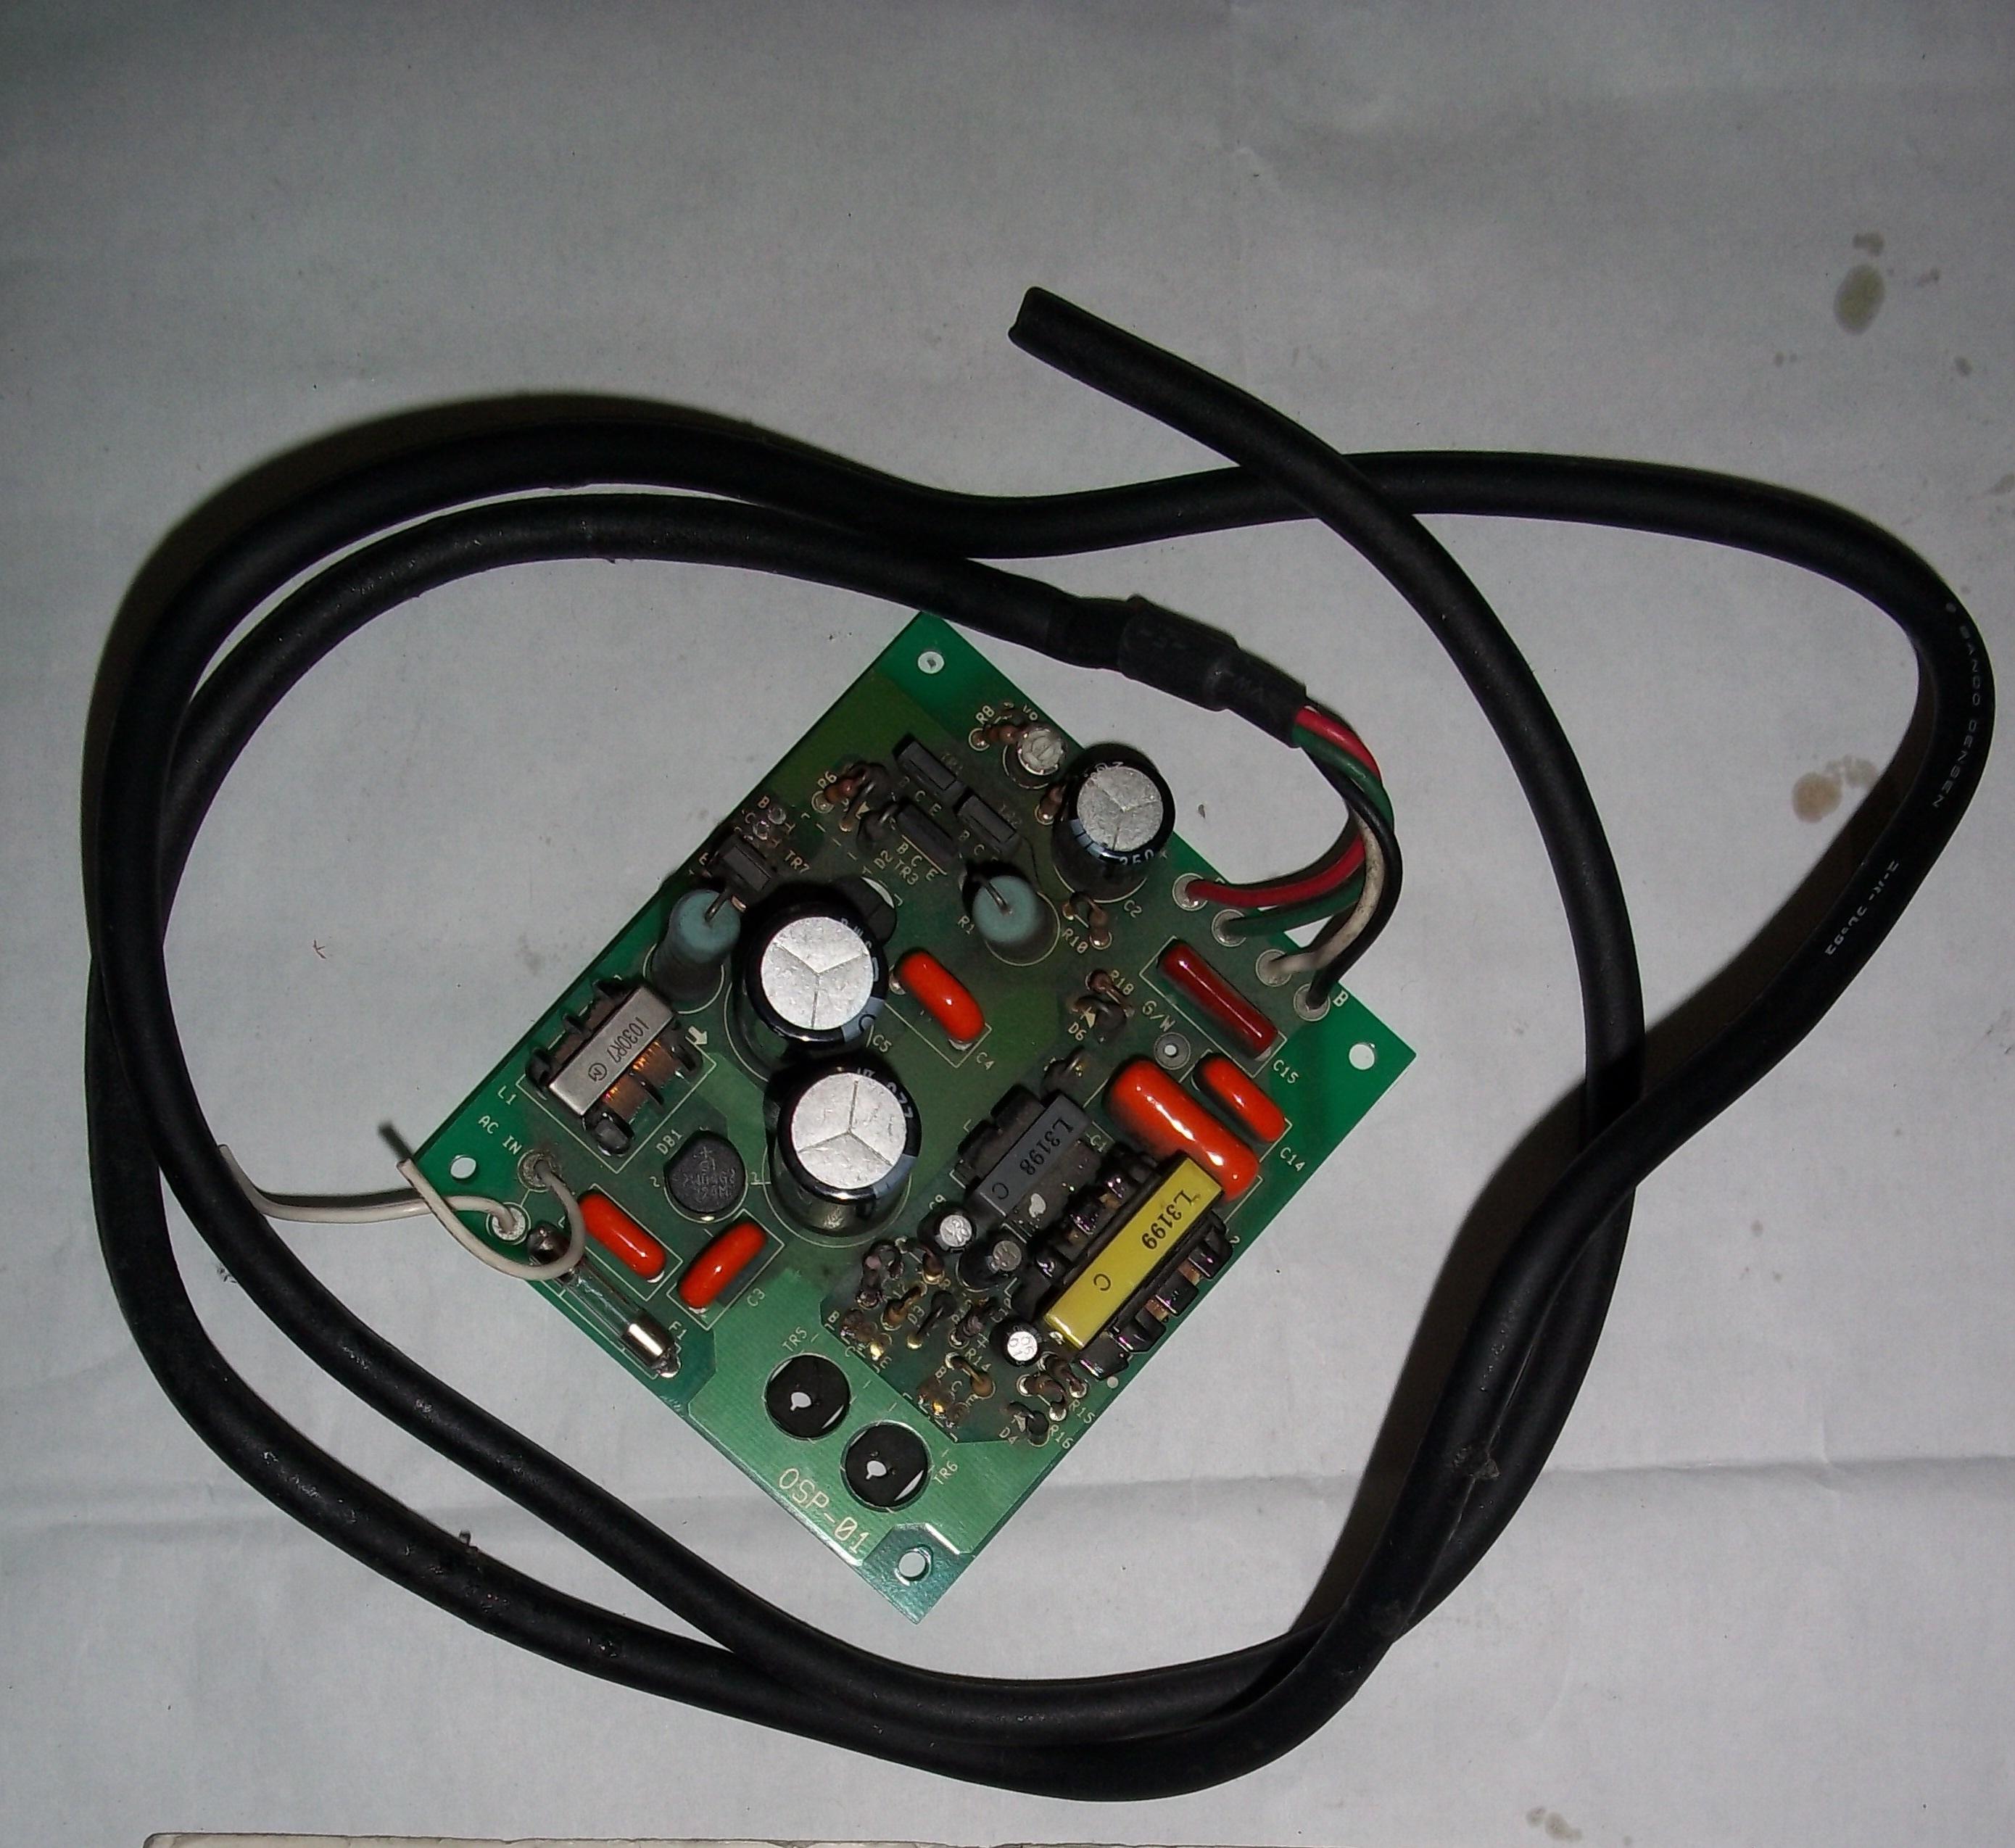 Repair 0SP-01 PCB PCB BOARD (0SP-01) in Malaysia, Singapore, Thailand, Indonesia